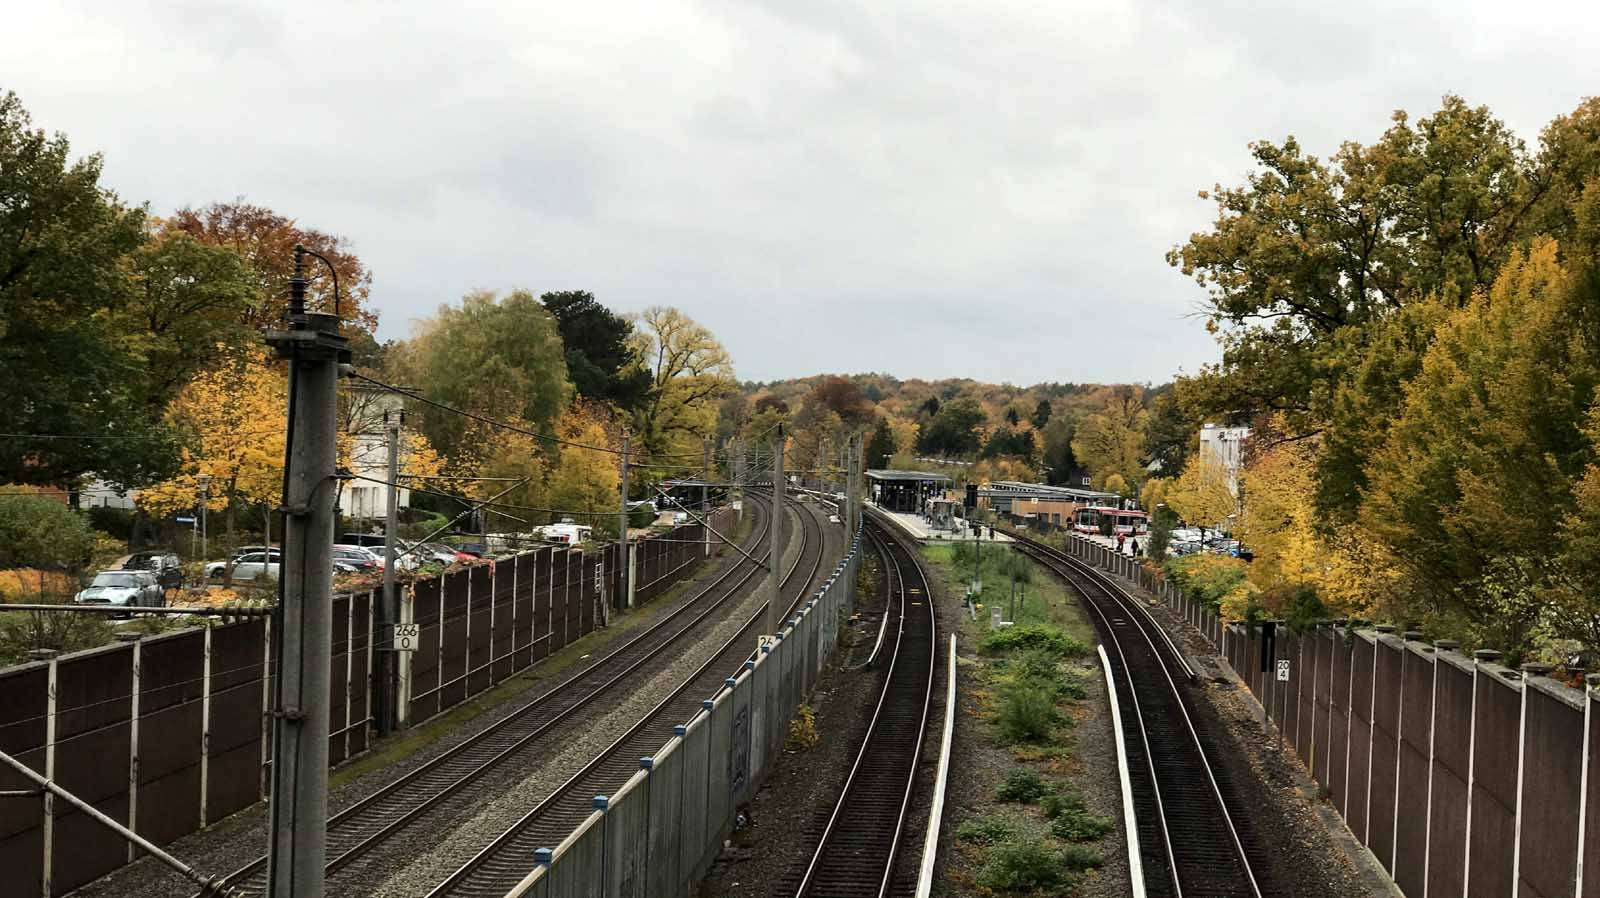 Bahnhof Reinbek im Herbst